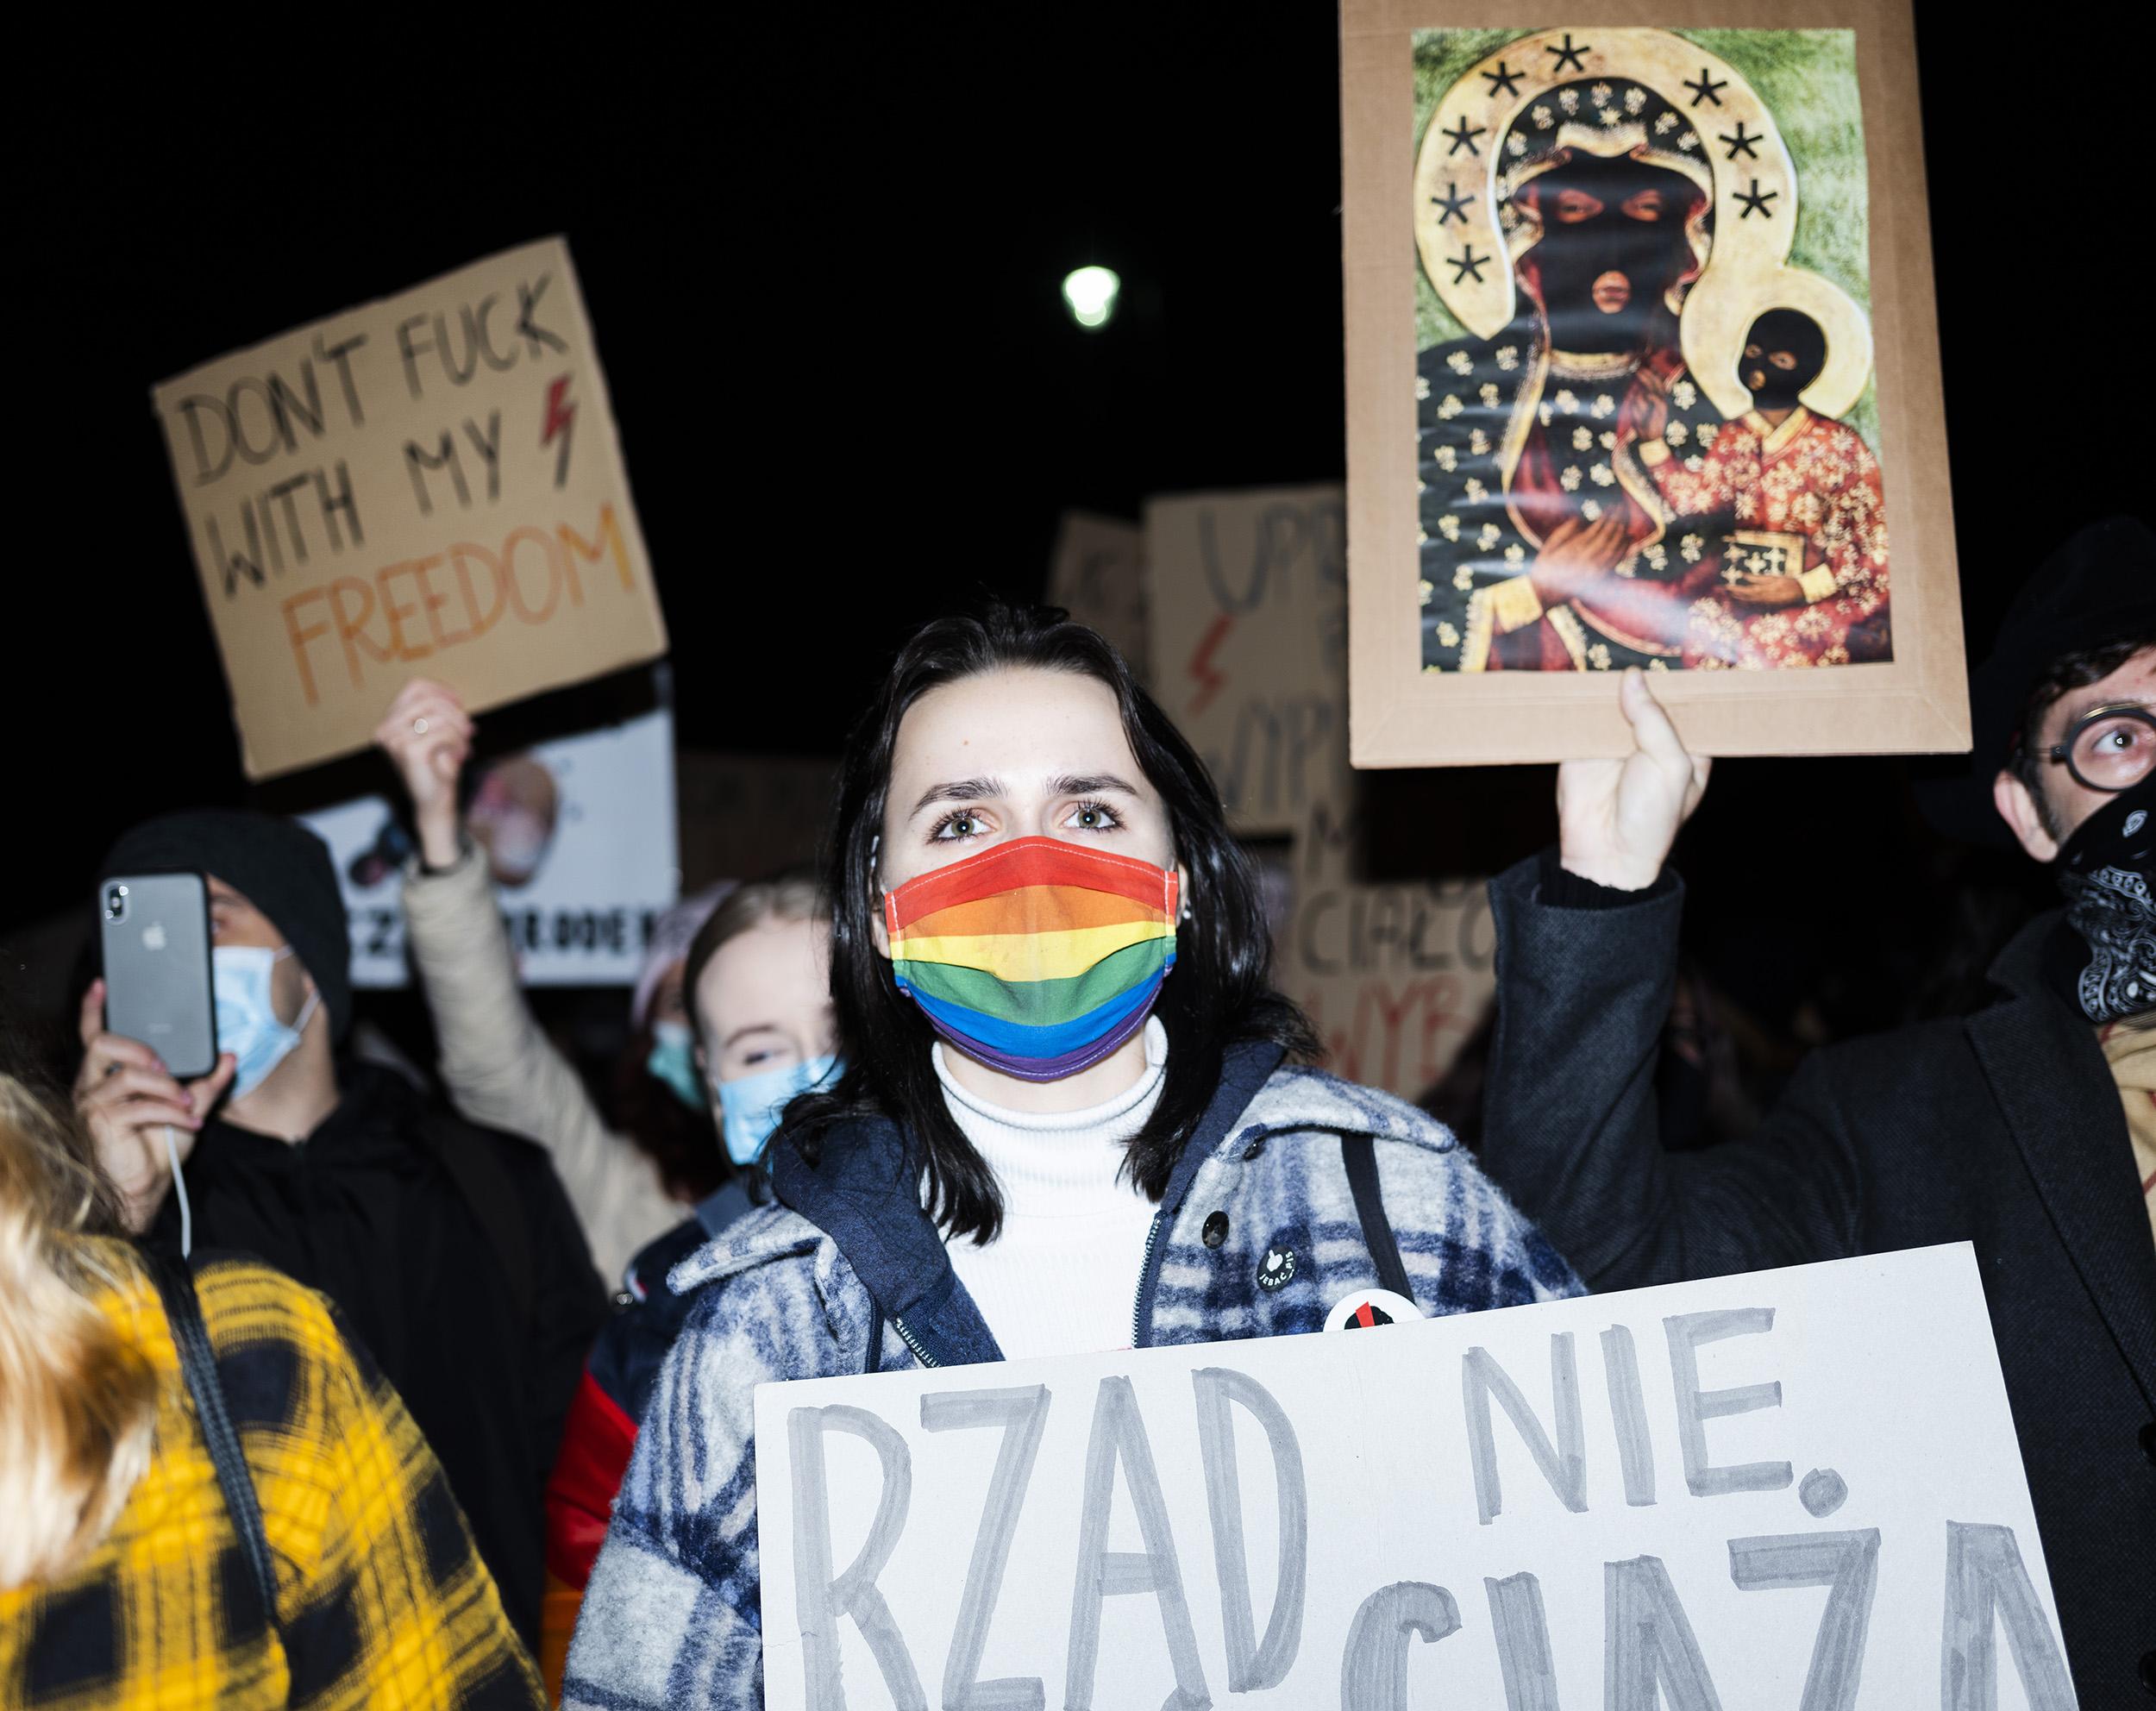 Archiwum Protestów Publicznych (Archive of Public Protests)